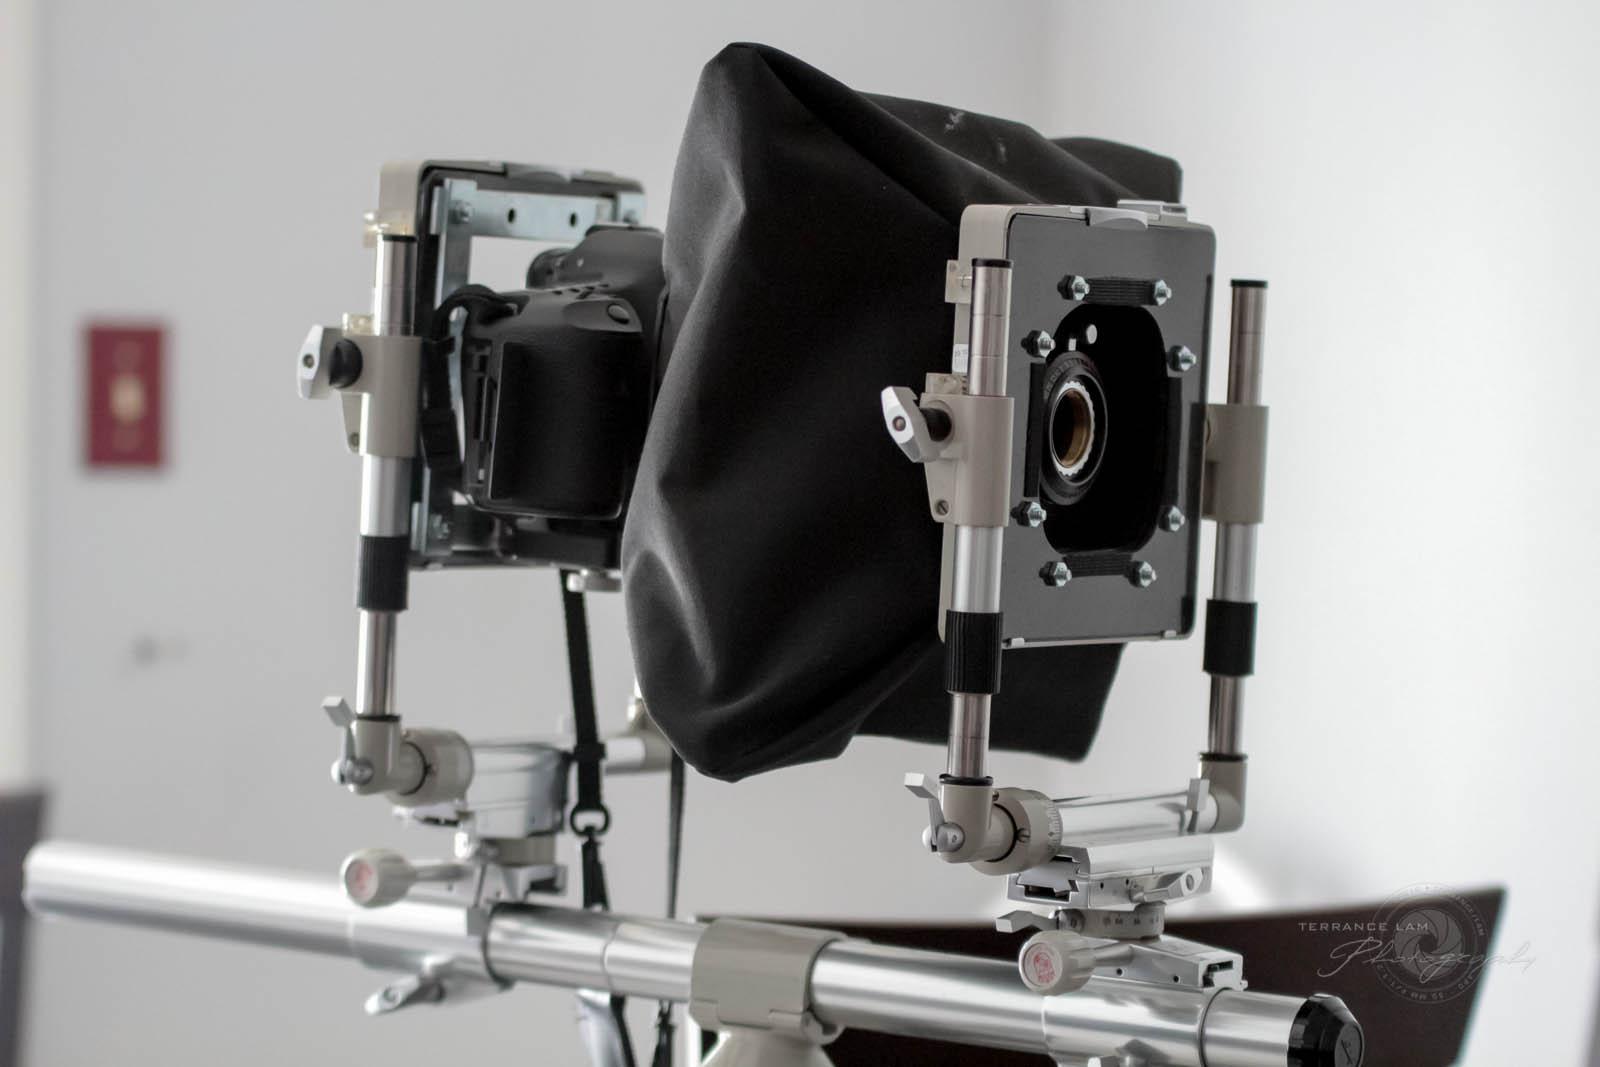 Made My Own Petzval Lens Sorta 85 F 22 Bokeh Control Brass